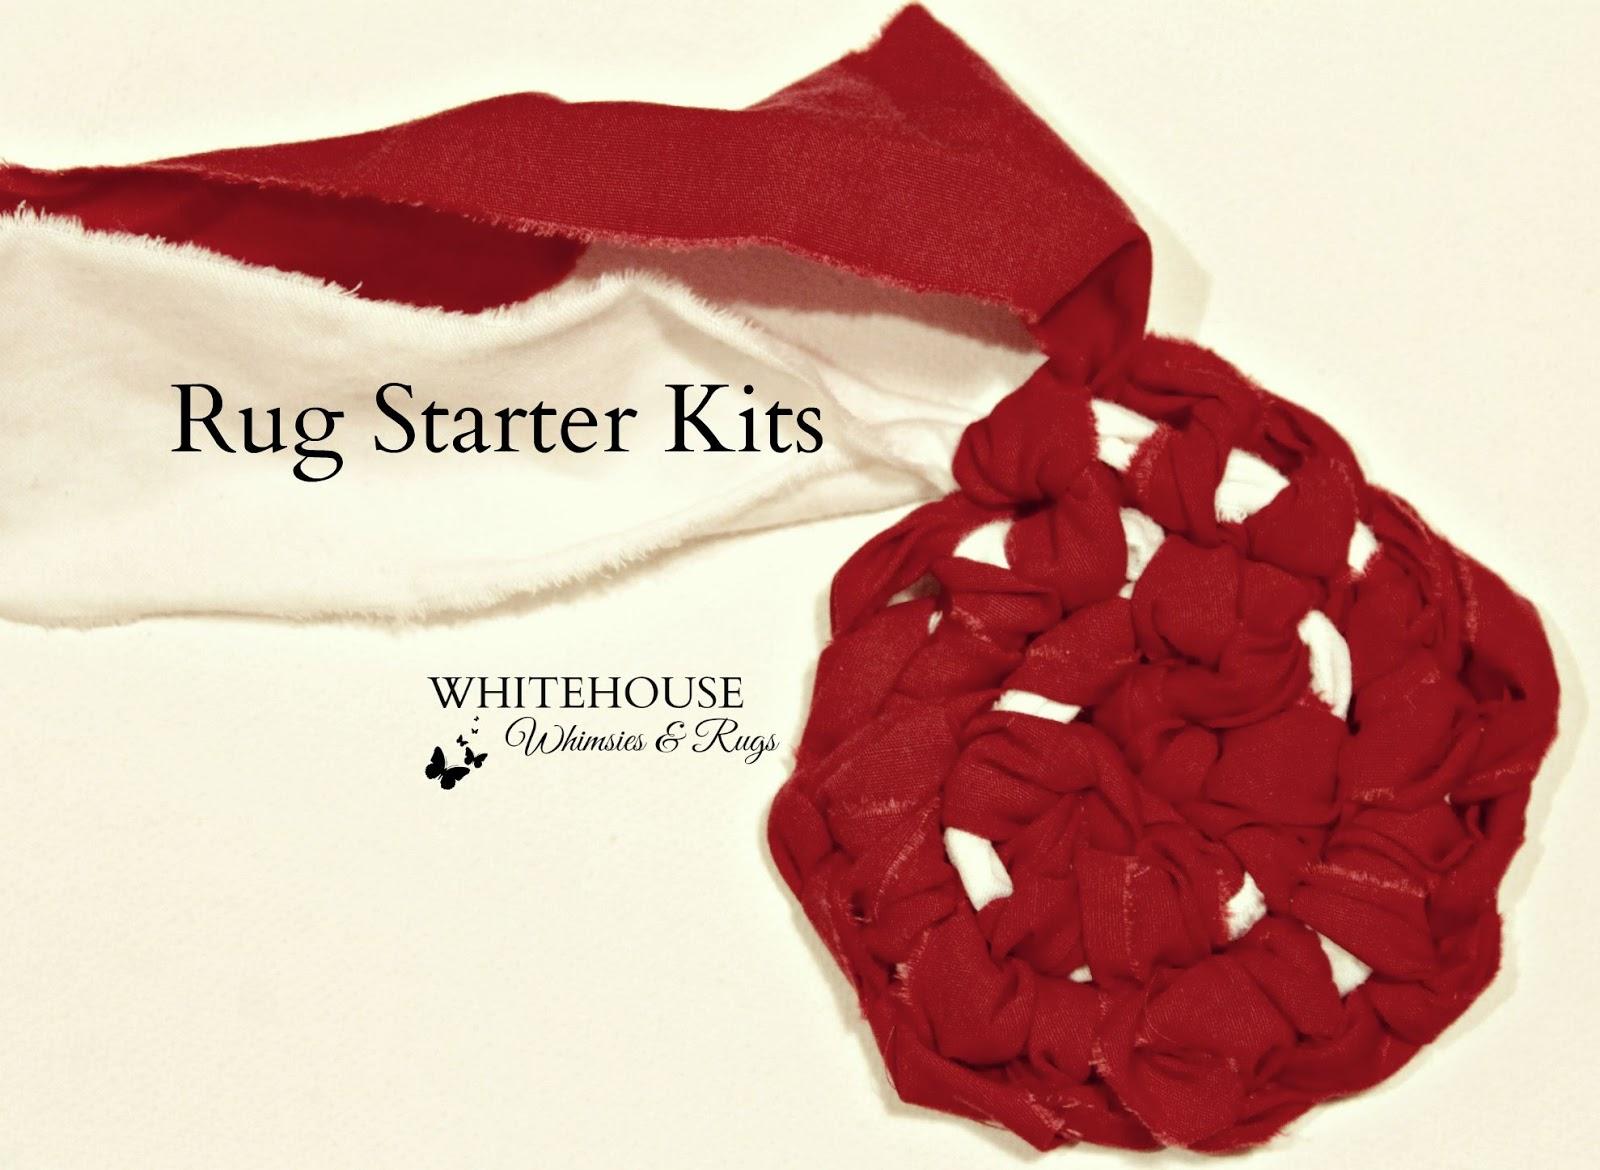 Rug Starter Kits On Etsy